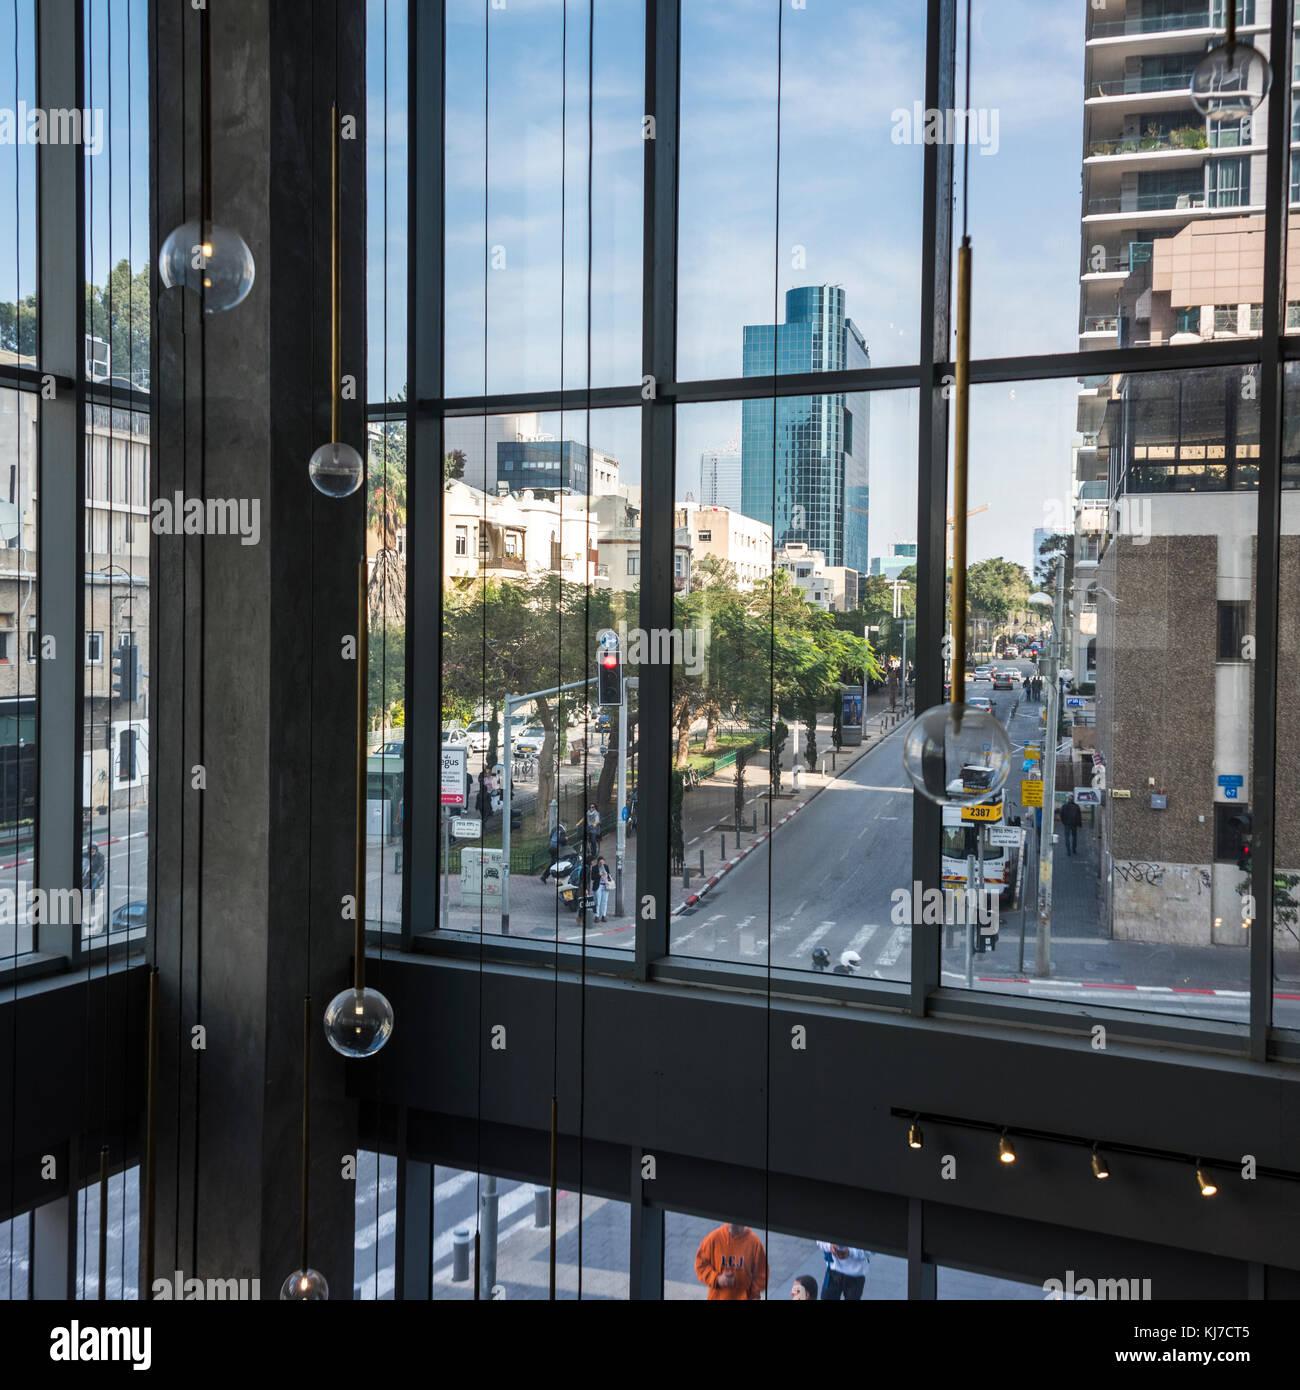 Street view from window of office building, Rothschild Boulevard, Tel Aviv, Israel - Stock Image